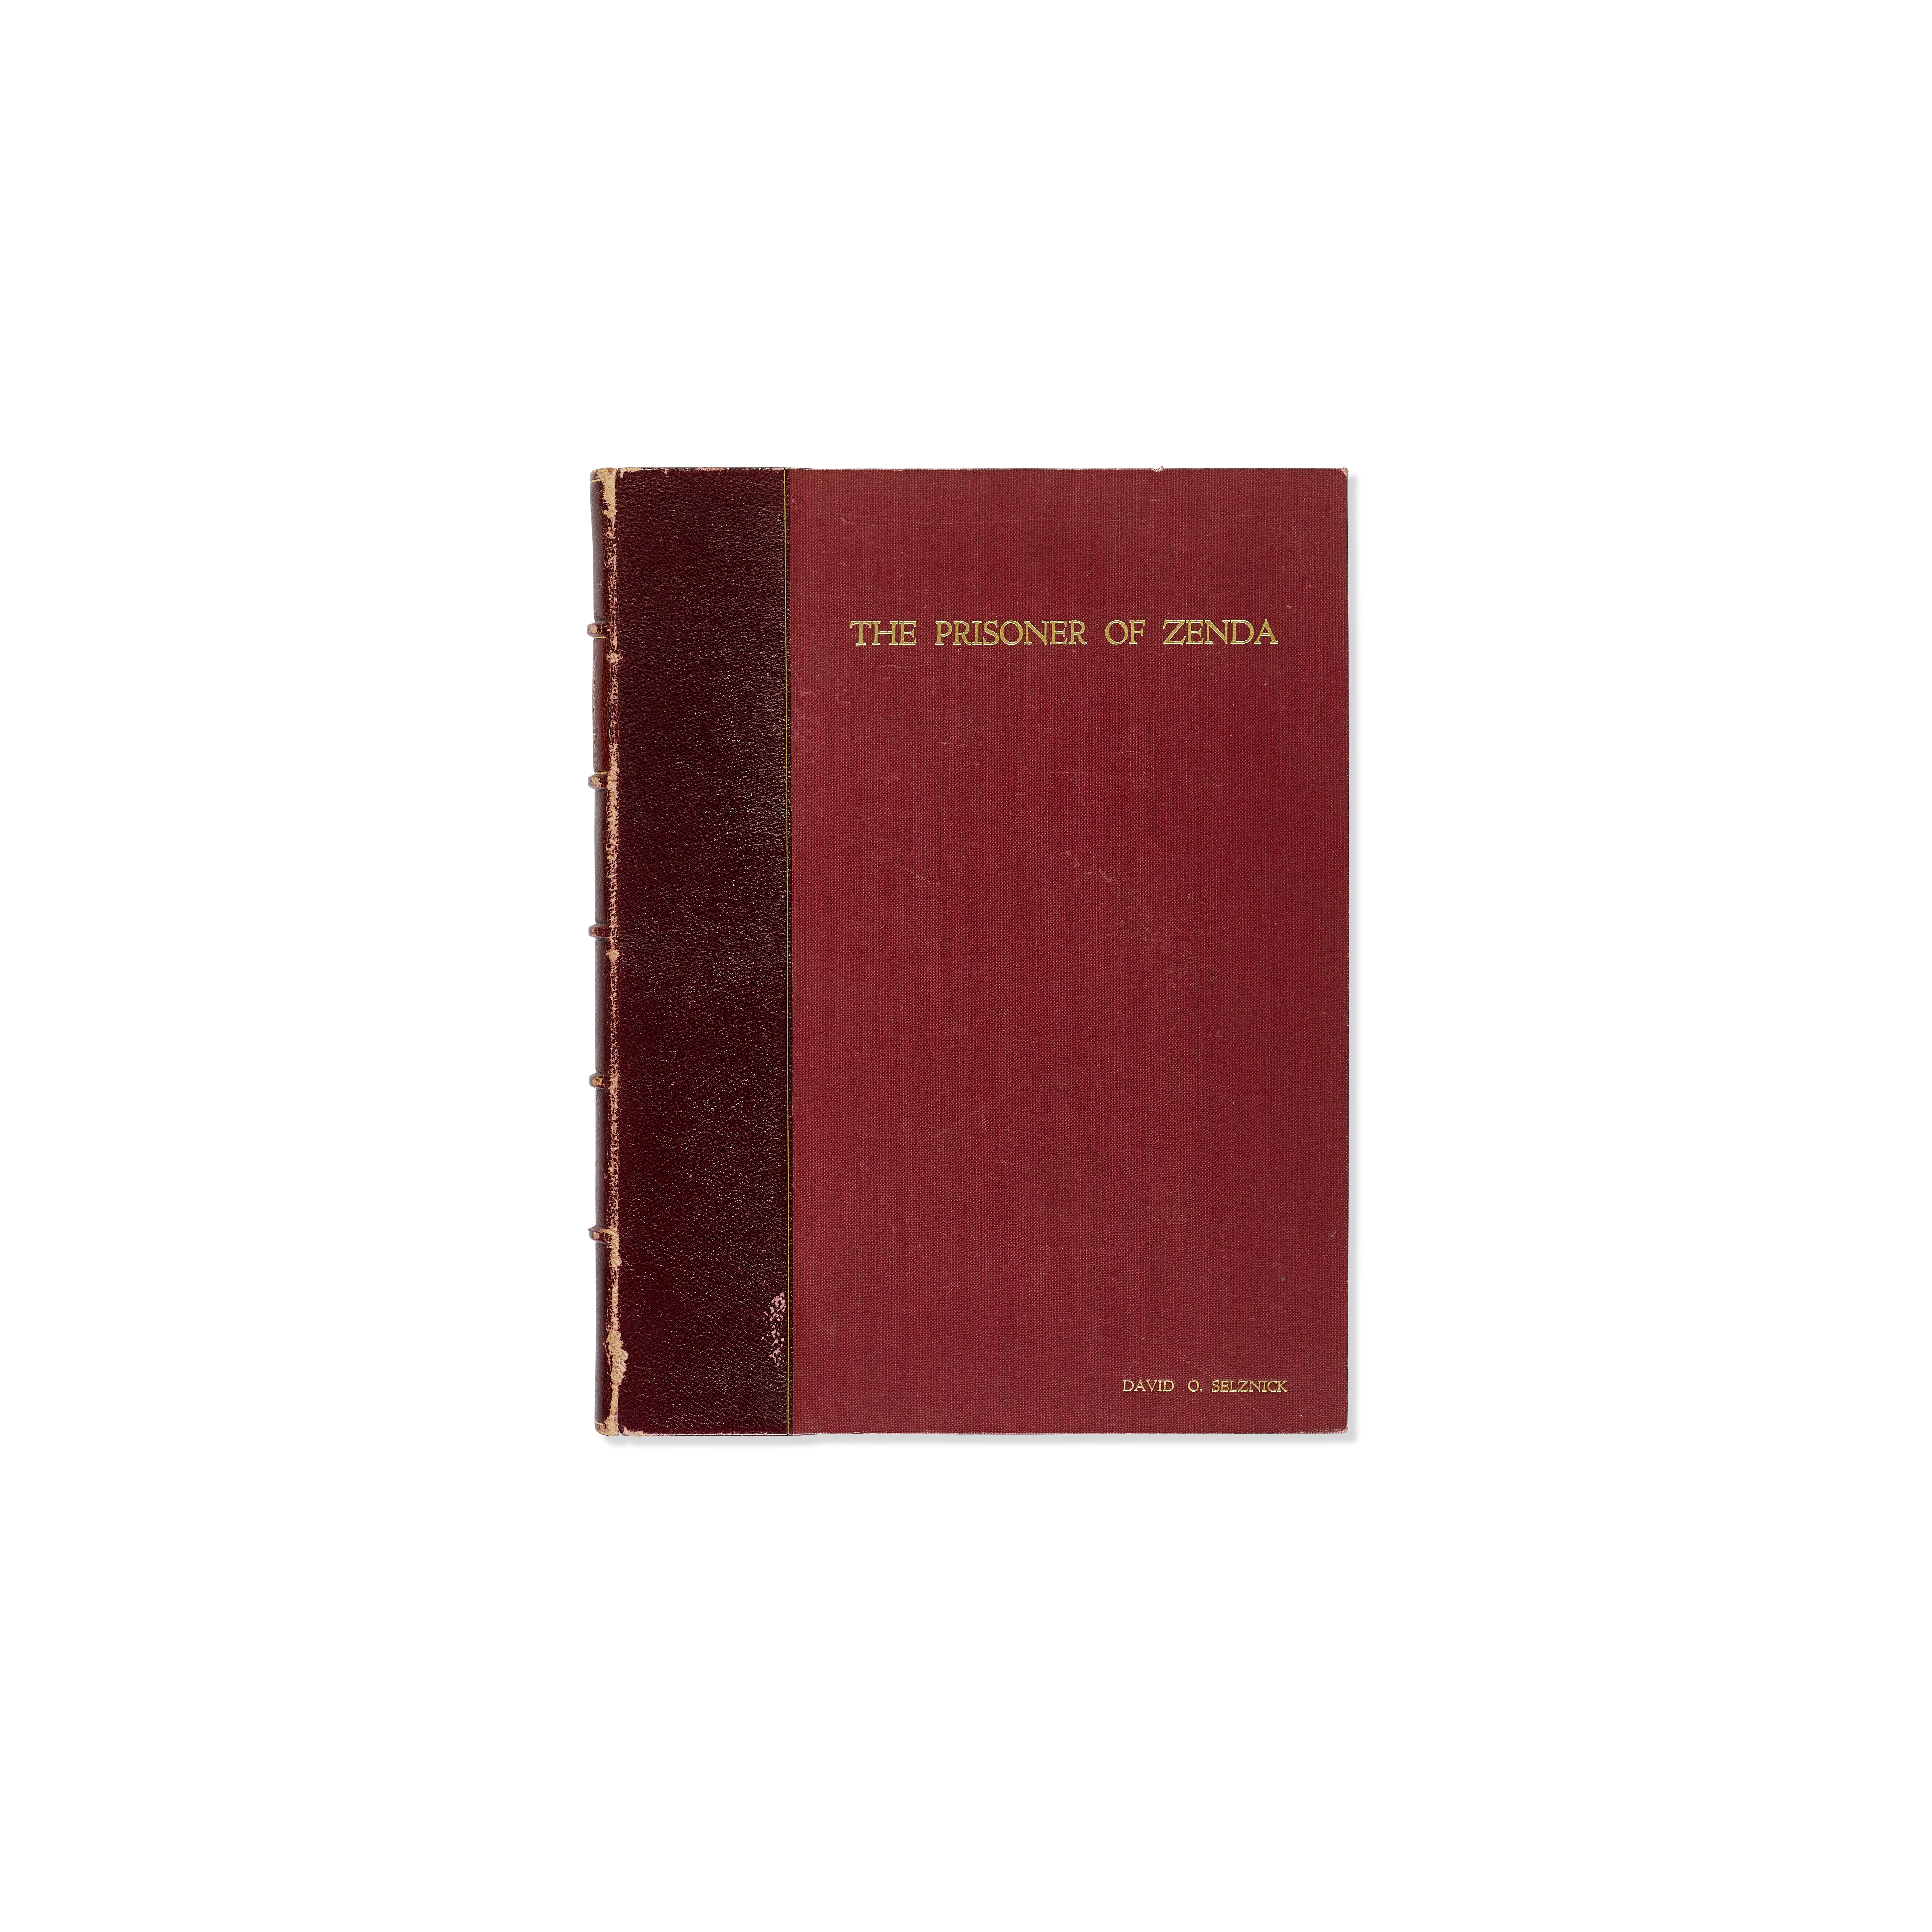 A David O. Selznick custom-bound screenplay of The Prisoner of Zenda